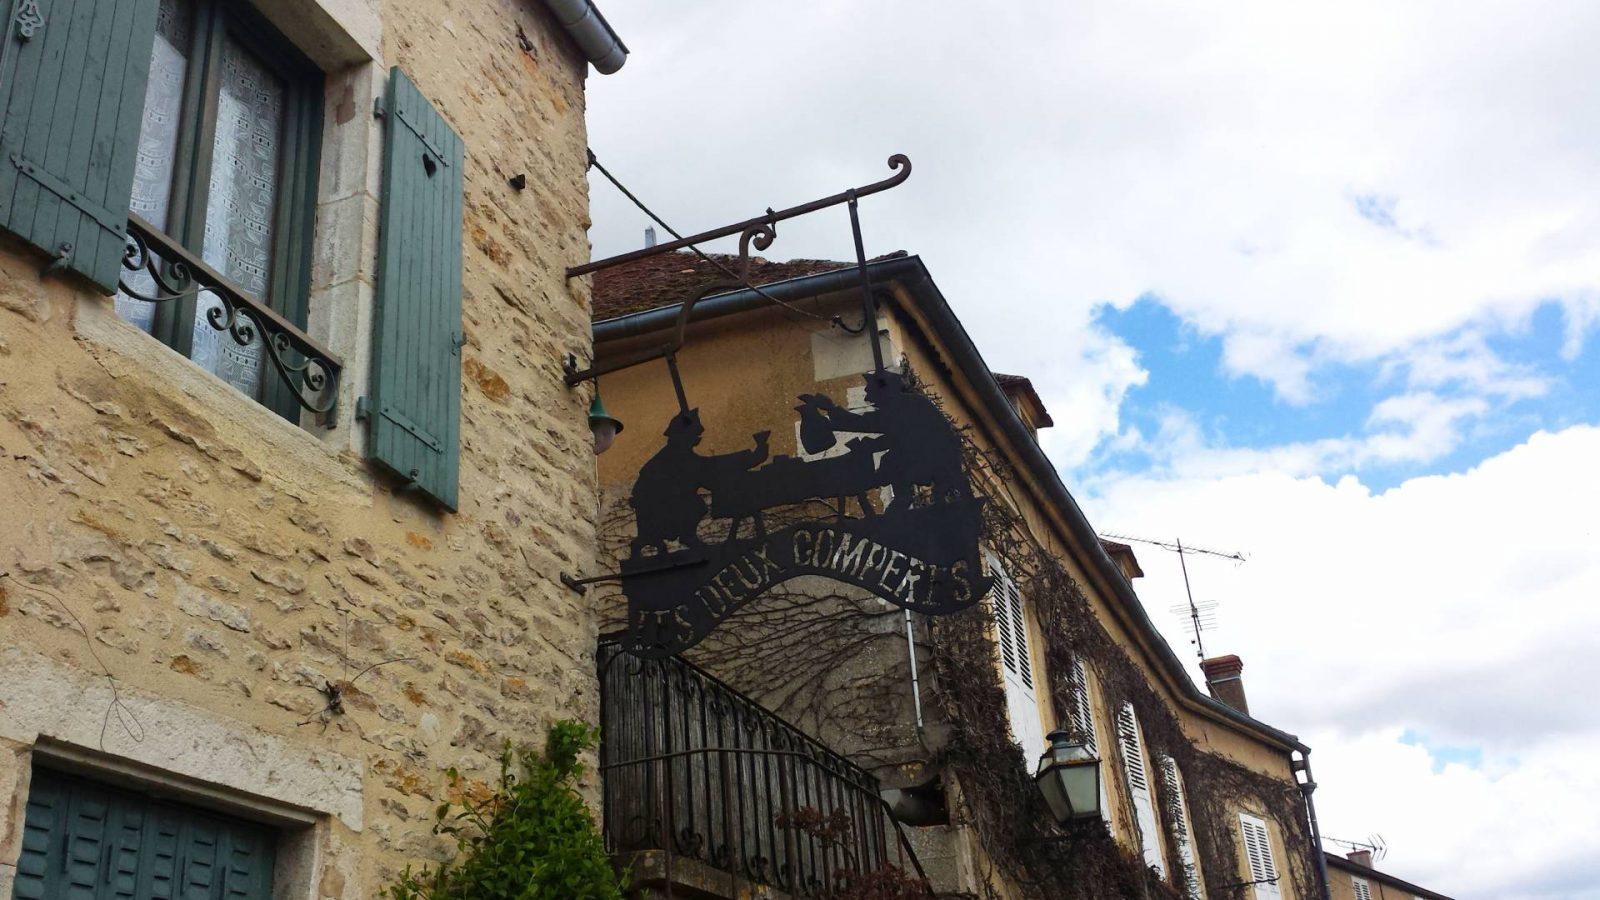 Les Deux Comperes sign Montreal Burgundy